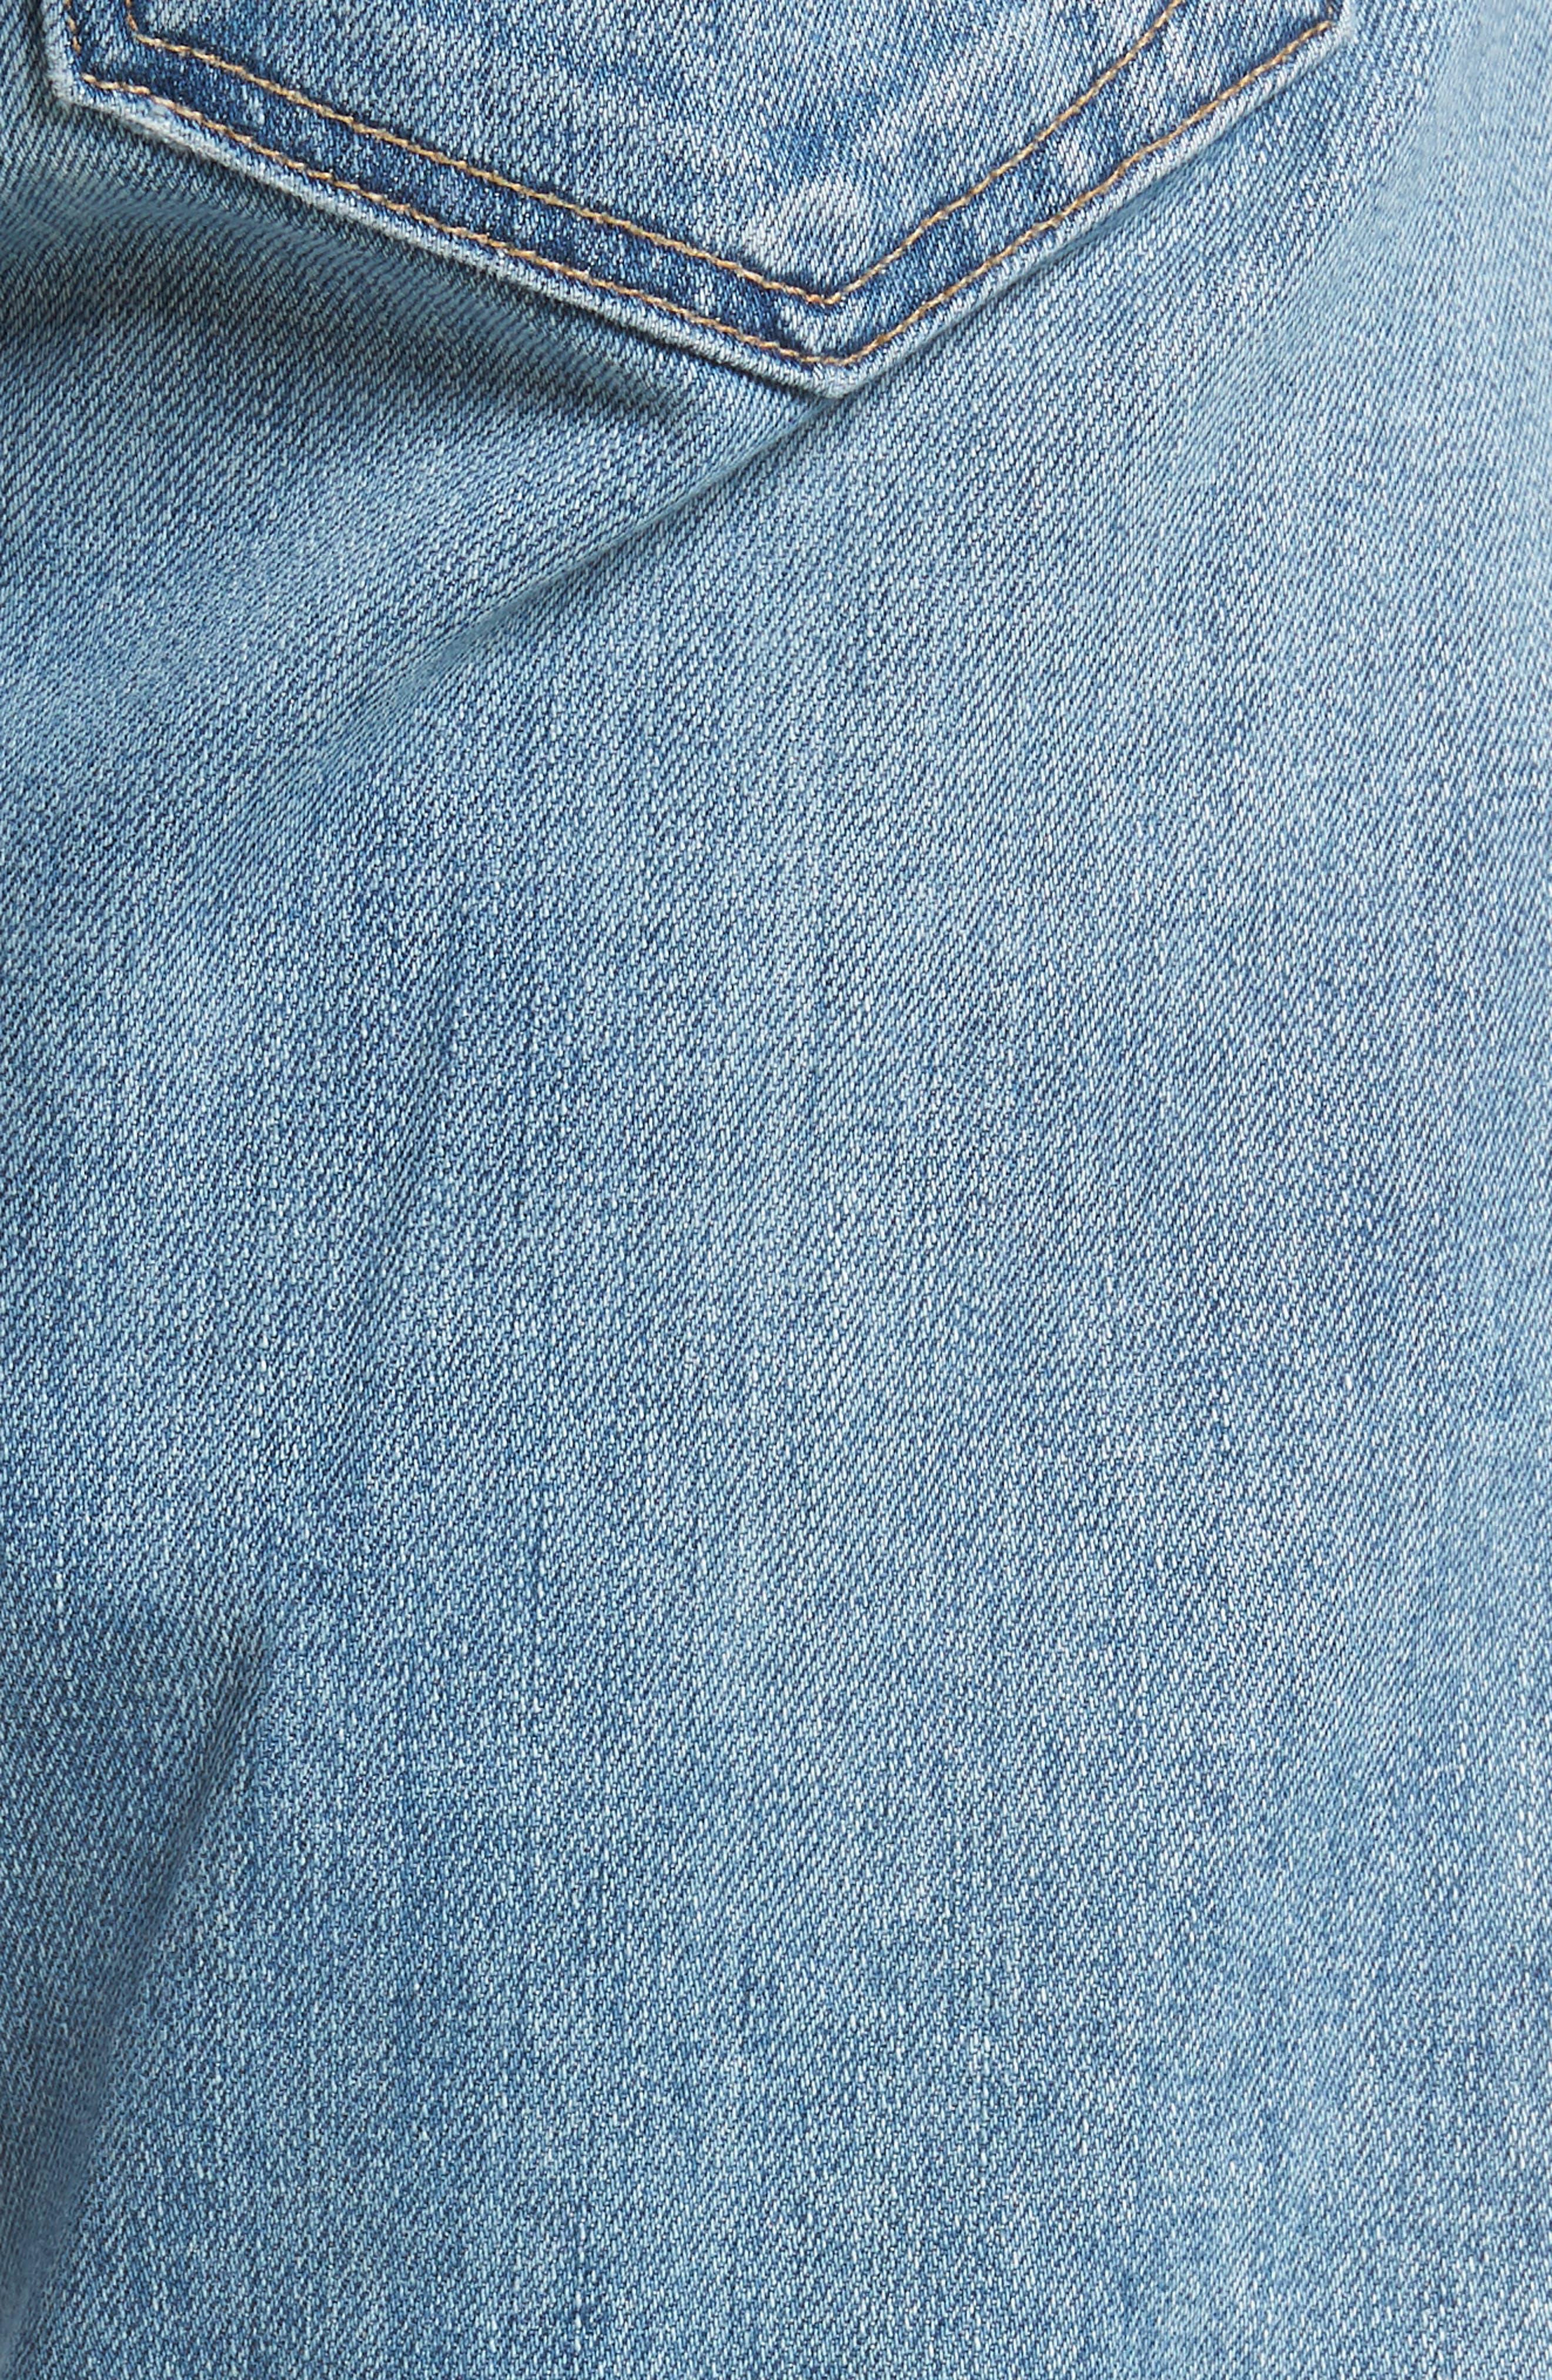 Fit 2 Slim Fit Jeans,                             Alternate thumbnail 5, color,                             PYLLE